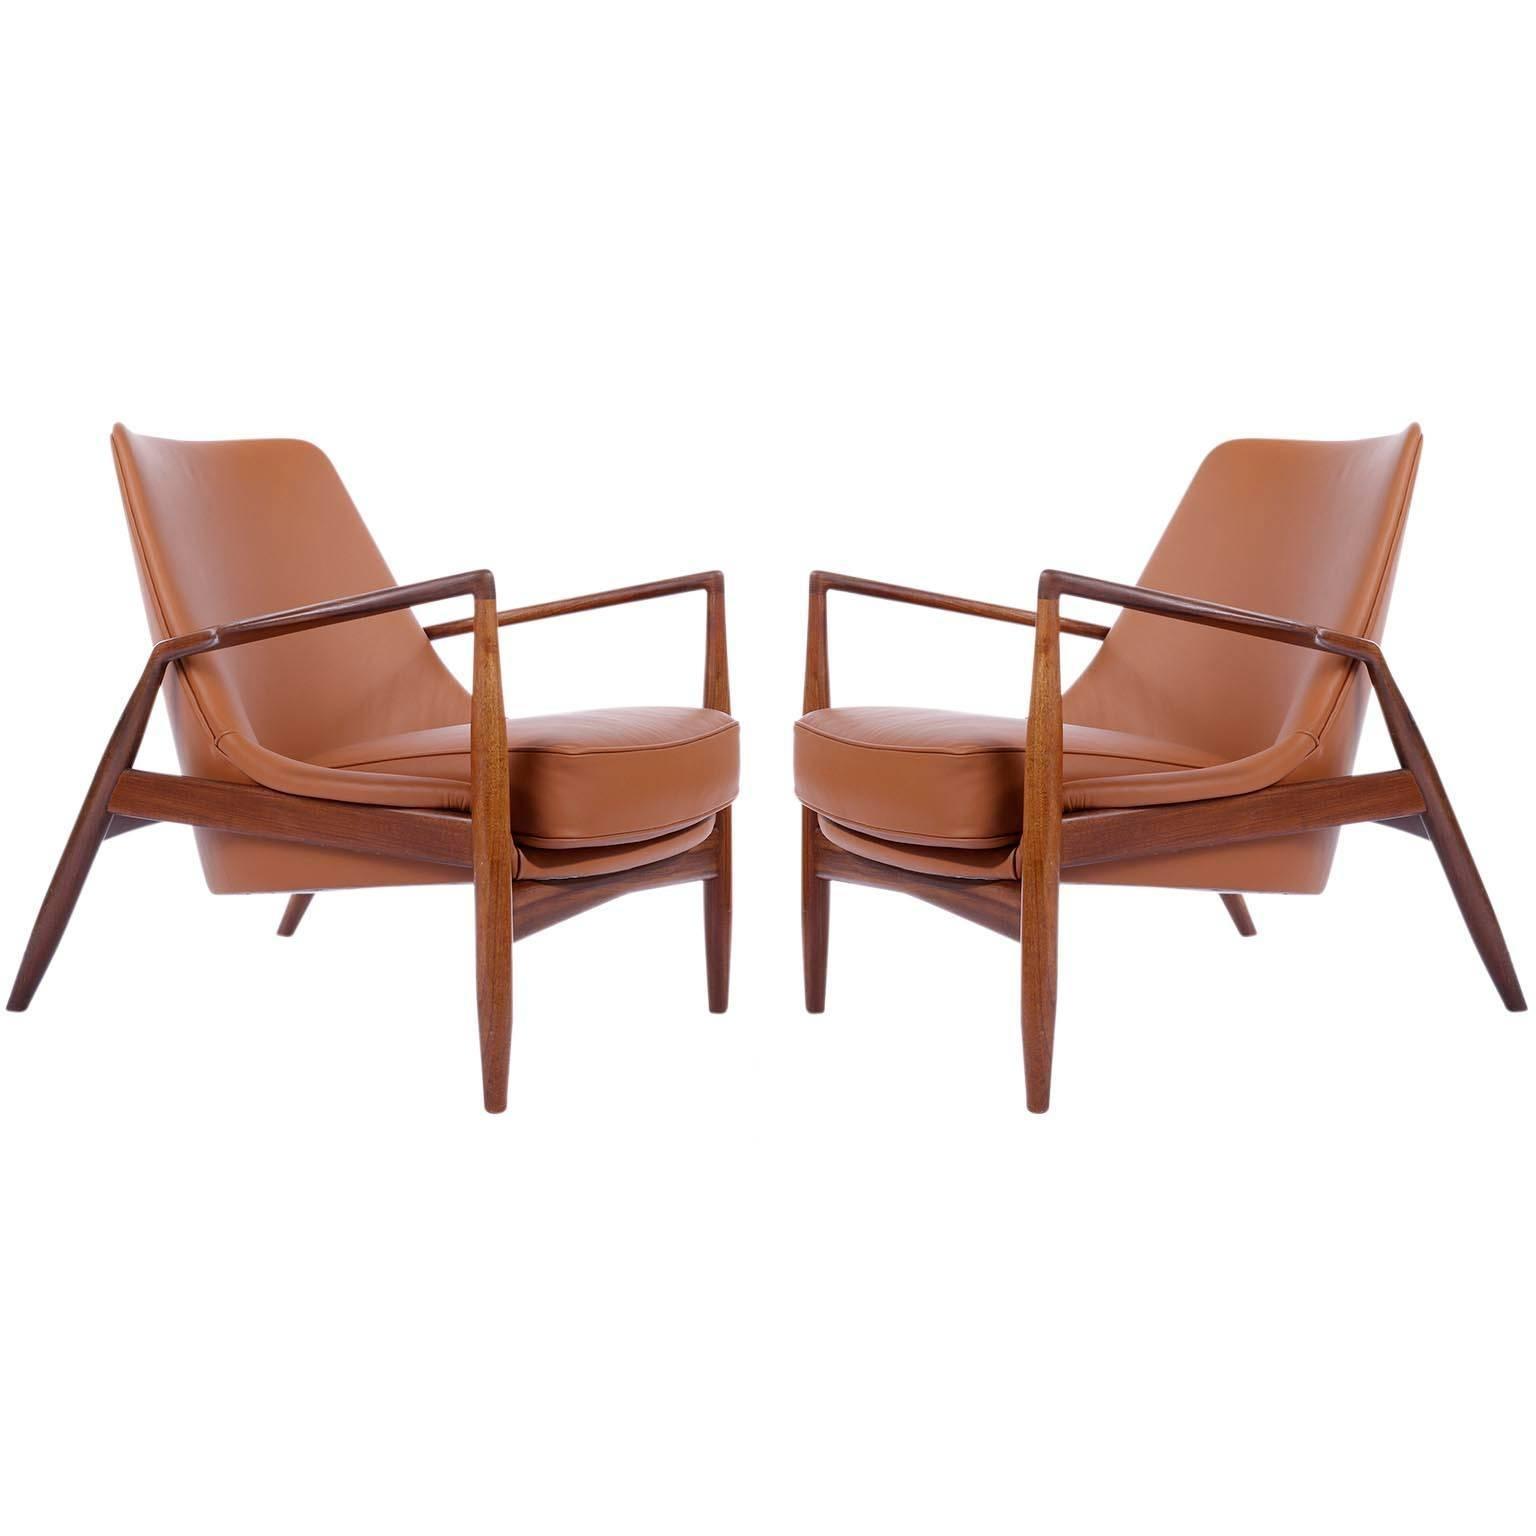 Ib Kofod Larsen Pair Of Seal Lounge Chairs In Teak Cognac Leather, Sweden,